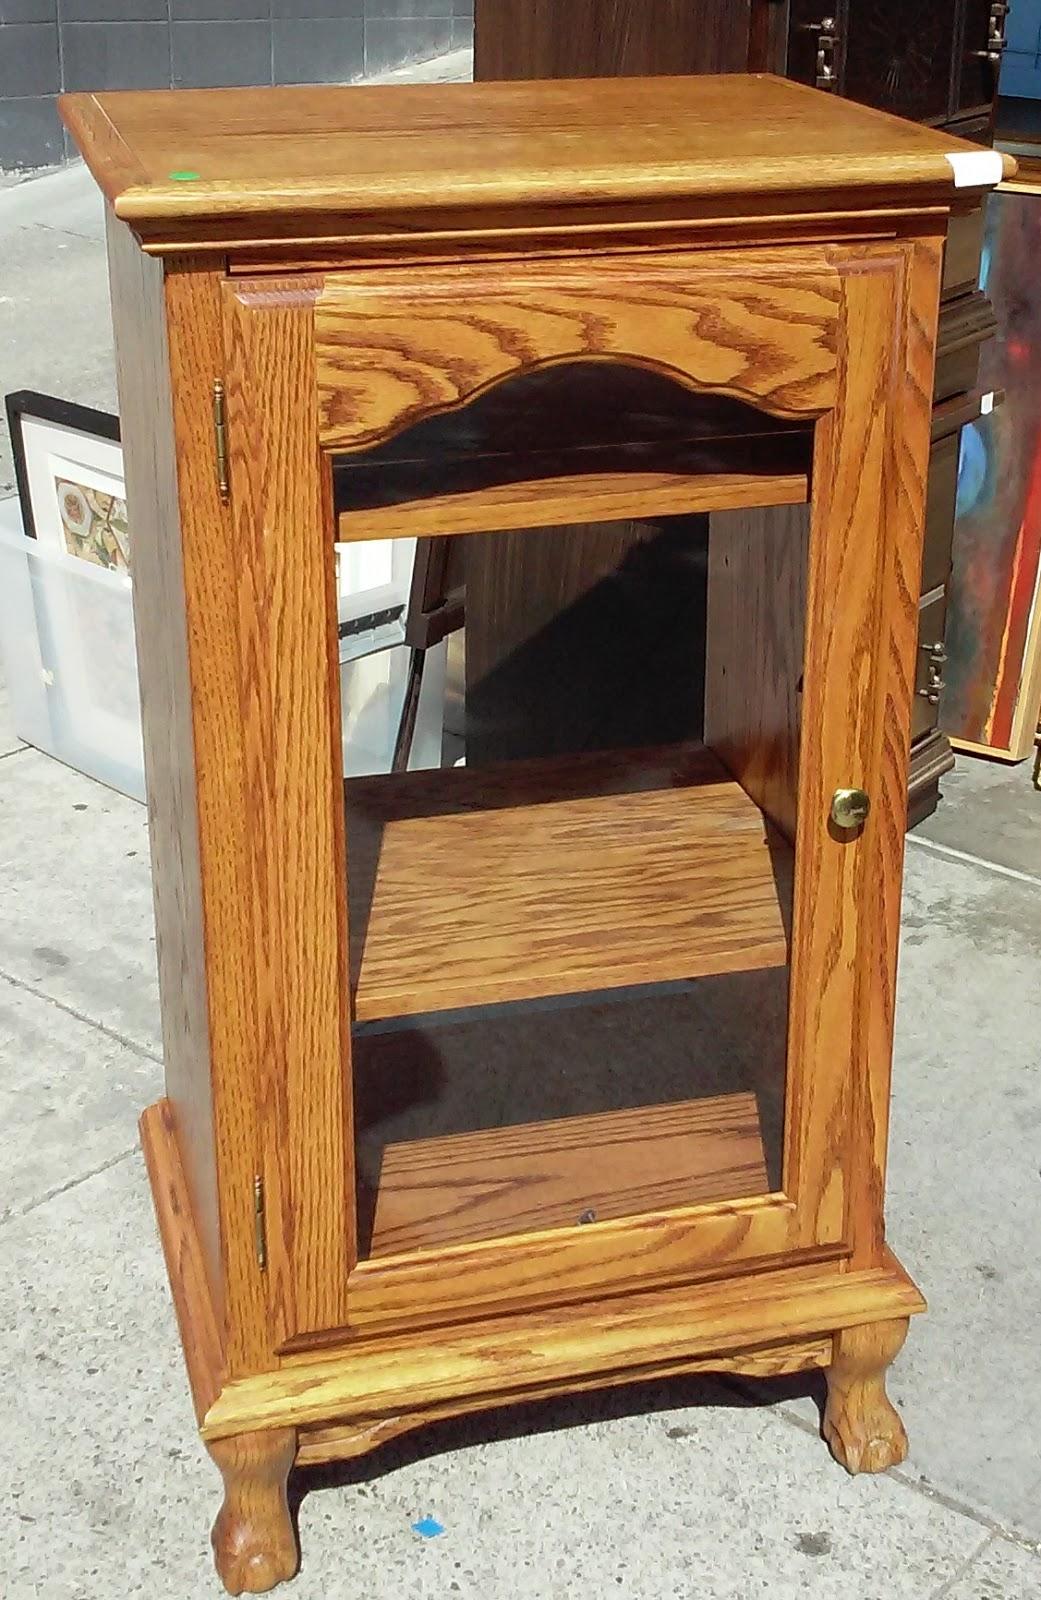 Fantastic Uhuru Furniture Collectibles Sold 4932 Claw Footed Oak 3 Interior Design Ideas Gentotryabchikinfo